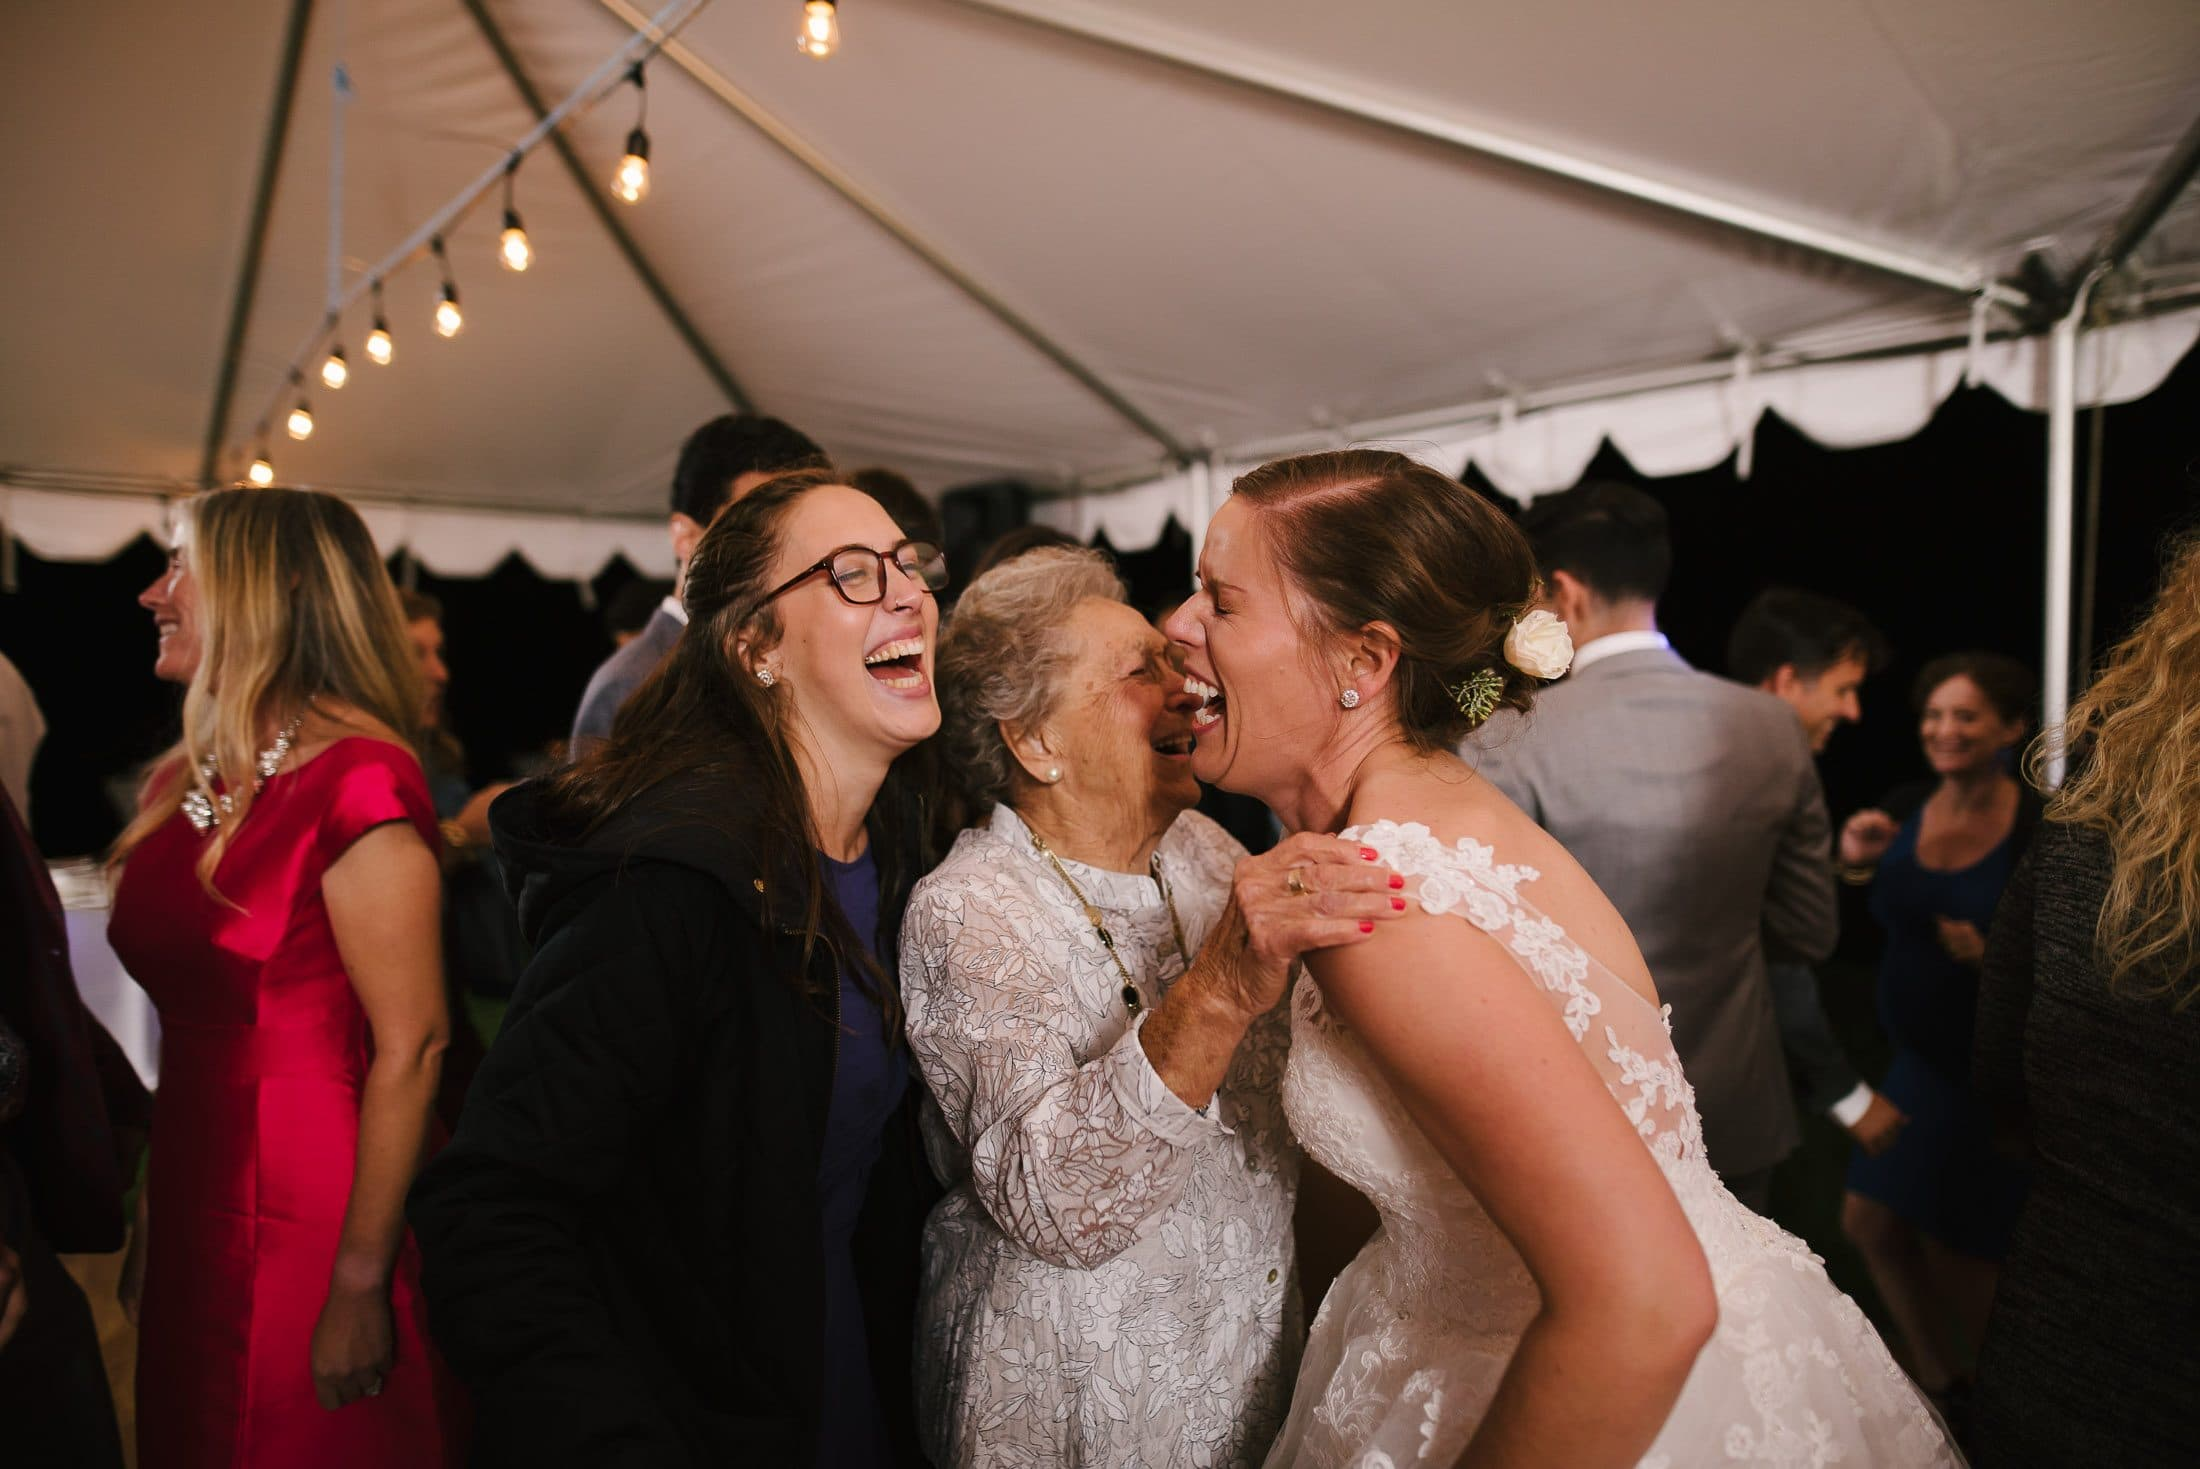 New York Wedding Dancing with Grandma